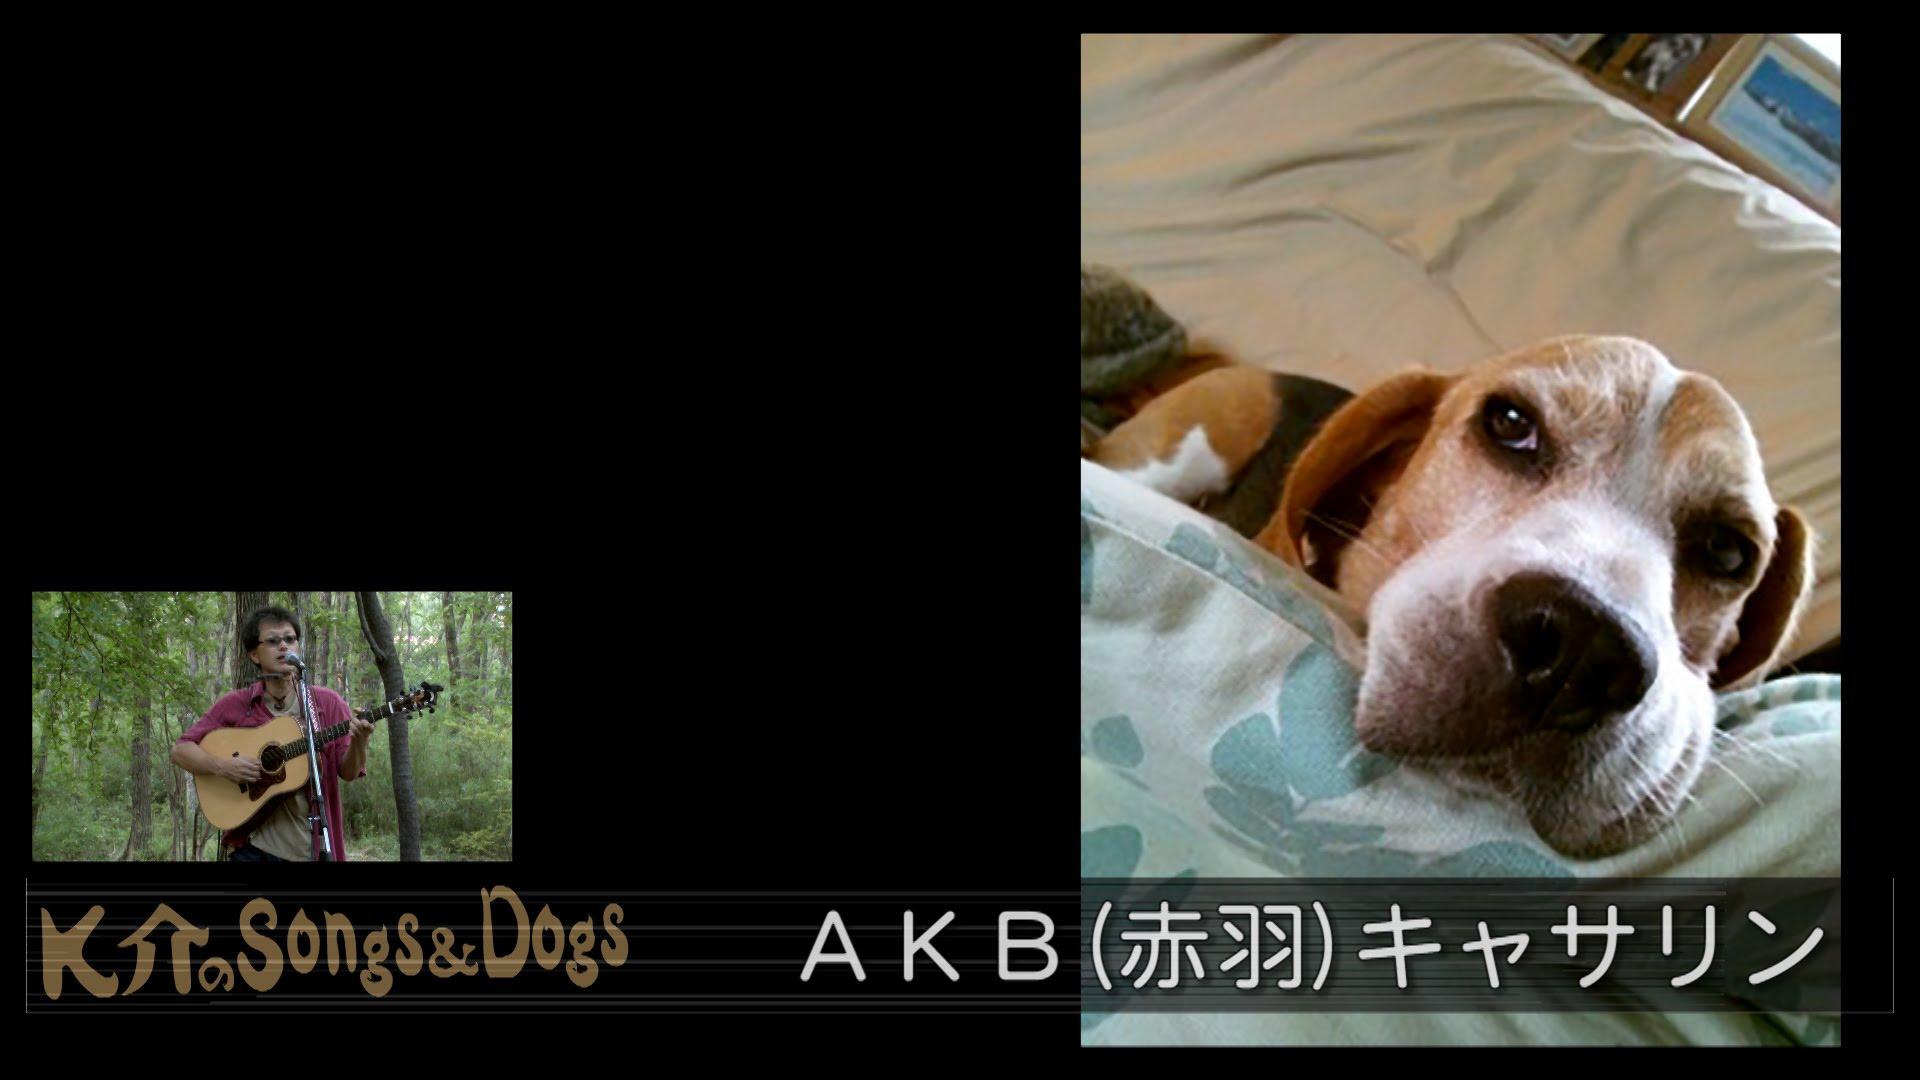 K介のSongs&Dogs週末はミュージシャン~31